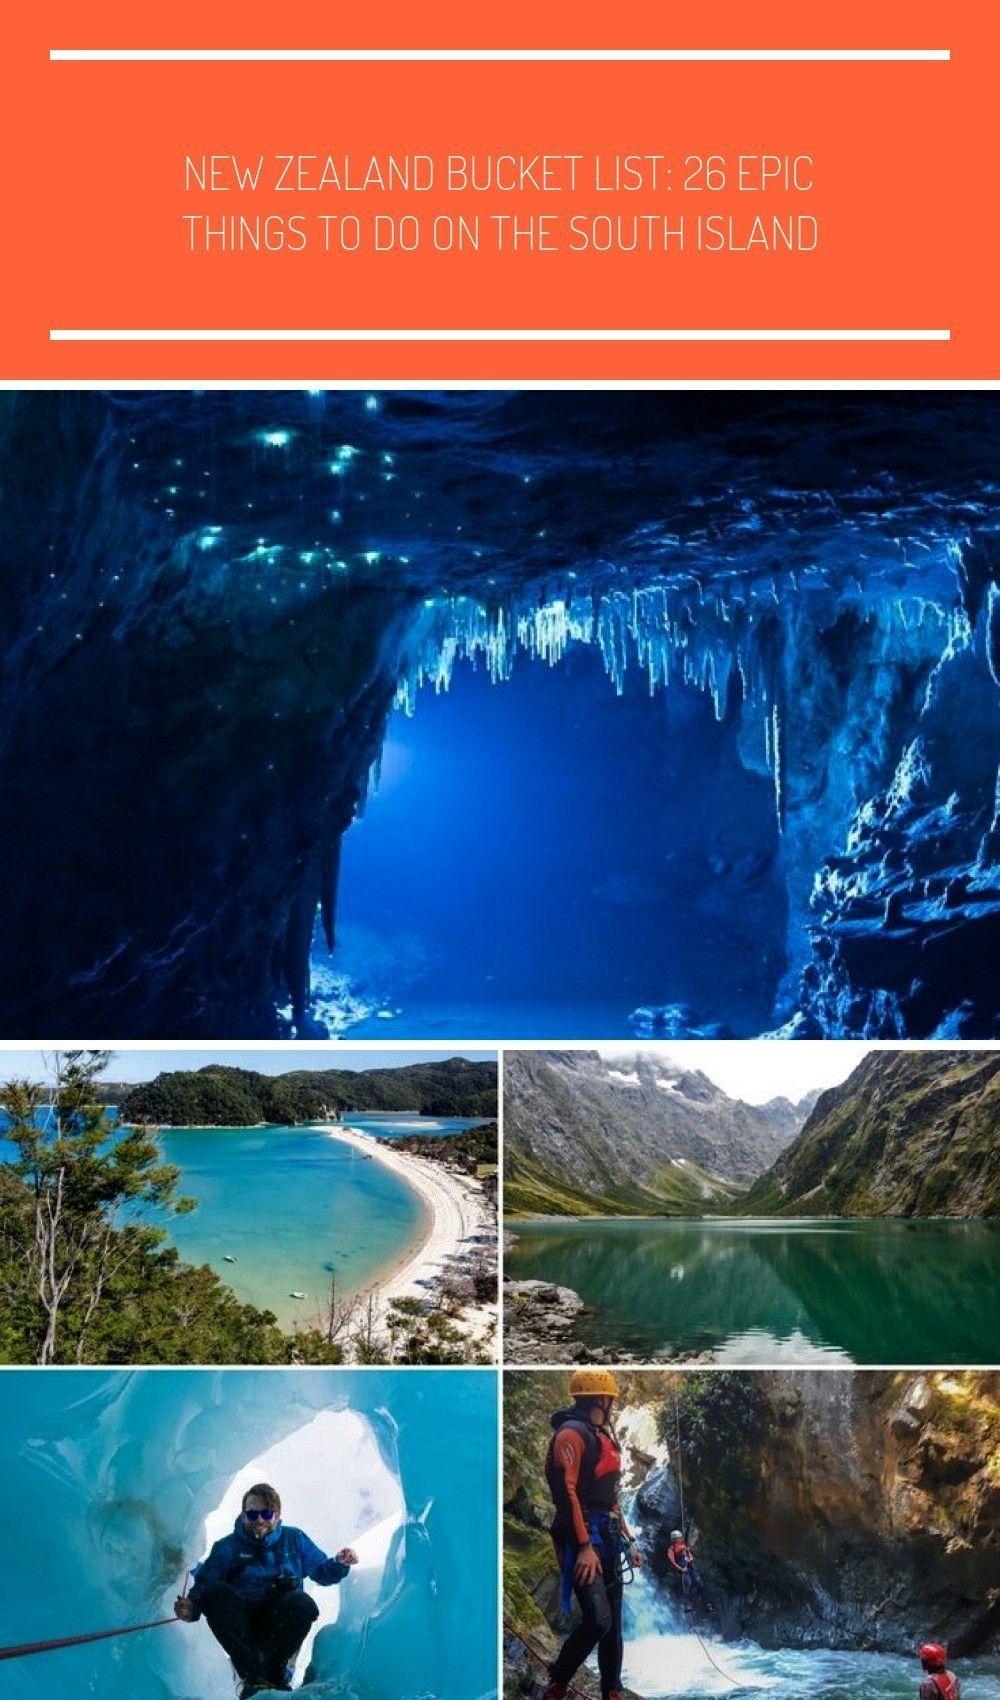 Cave, New Zealand zealand travel Waitomo Cave, New ZealandWaitomo Cave, New Zealand zealand travel